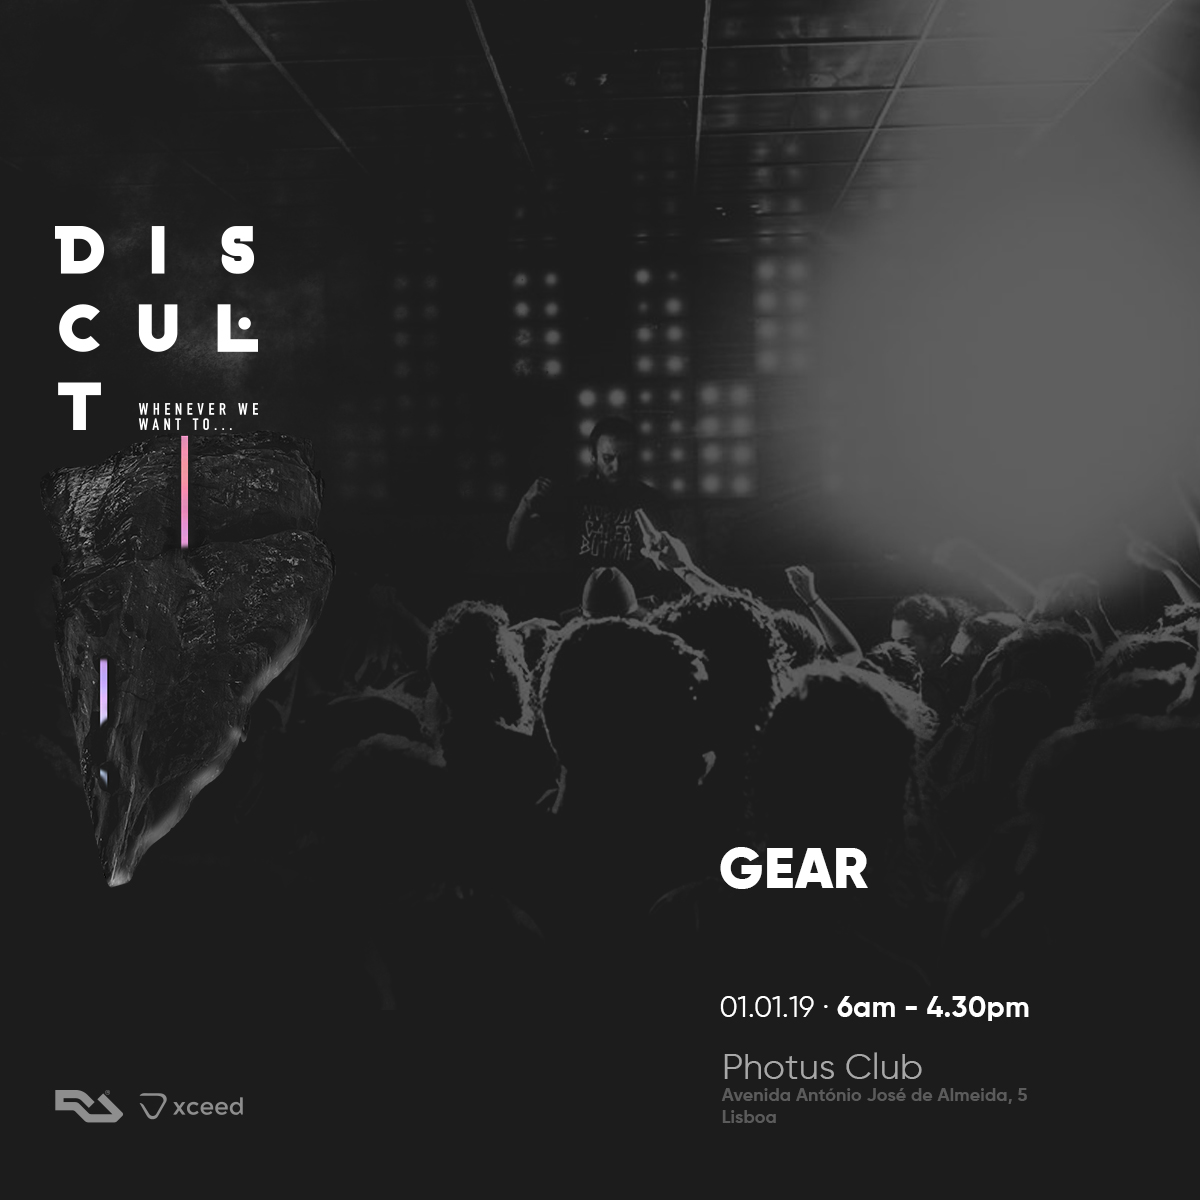 After_311218_Profile_Gear.jpg